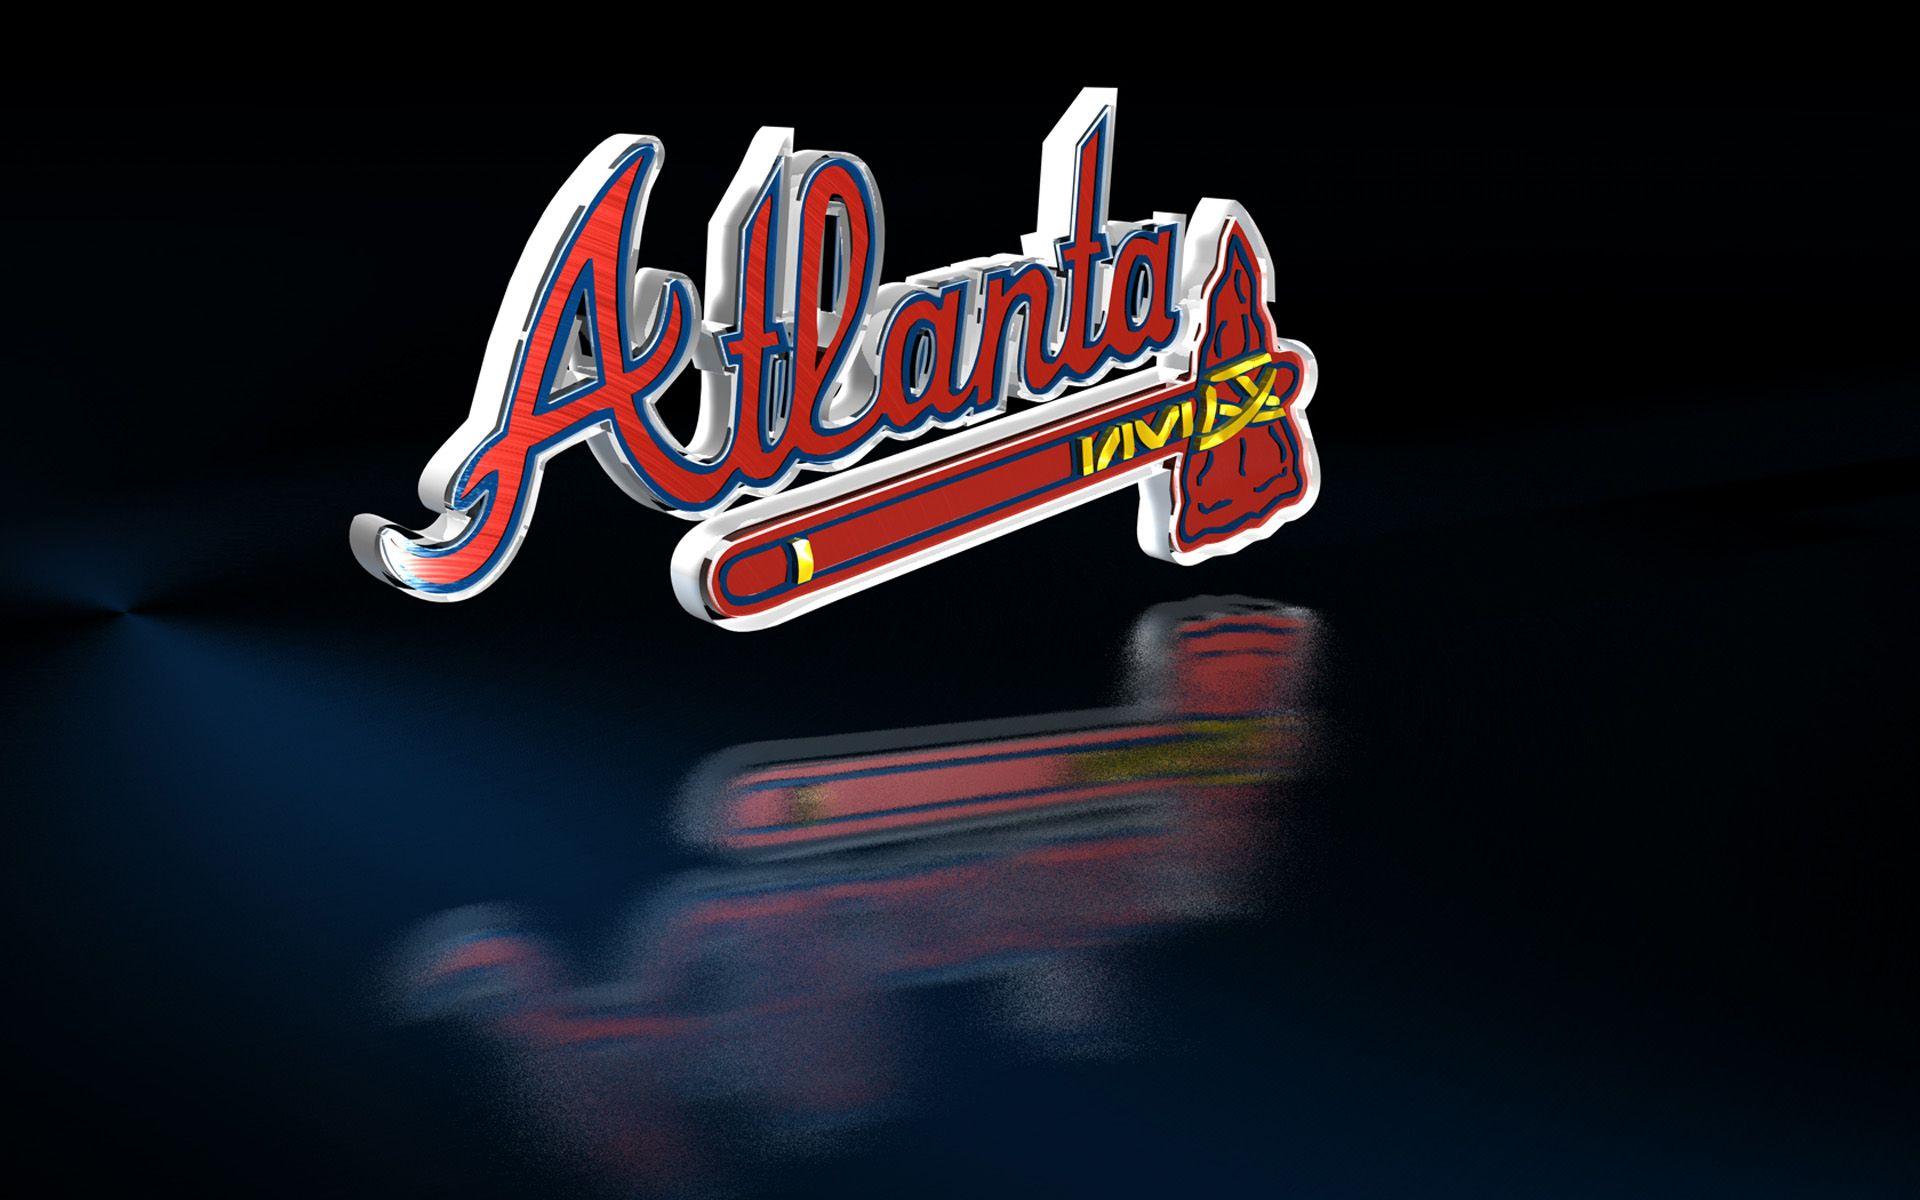 Bravosfeature Jpg 1920 1200 Atlanta Braves Wallpaper Braves Tickets Atlanta Braves